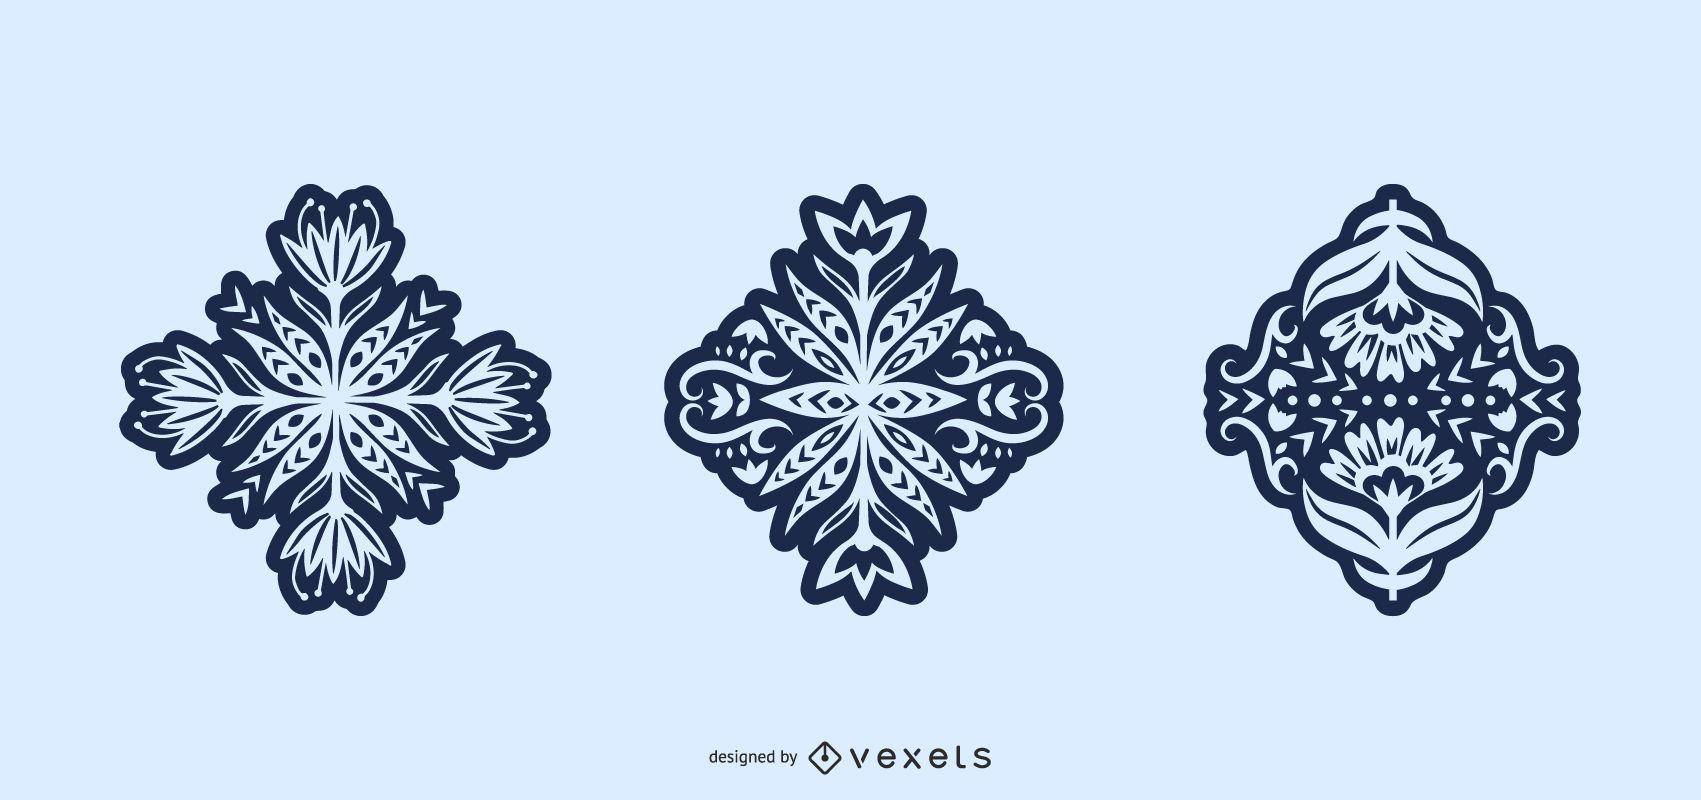 Flowers folk art silhouette set